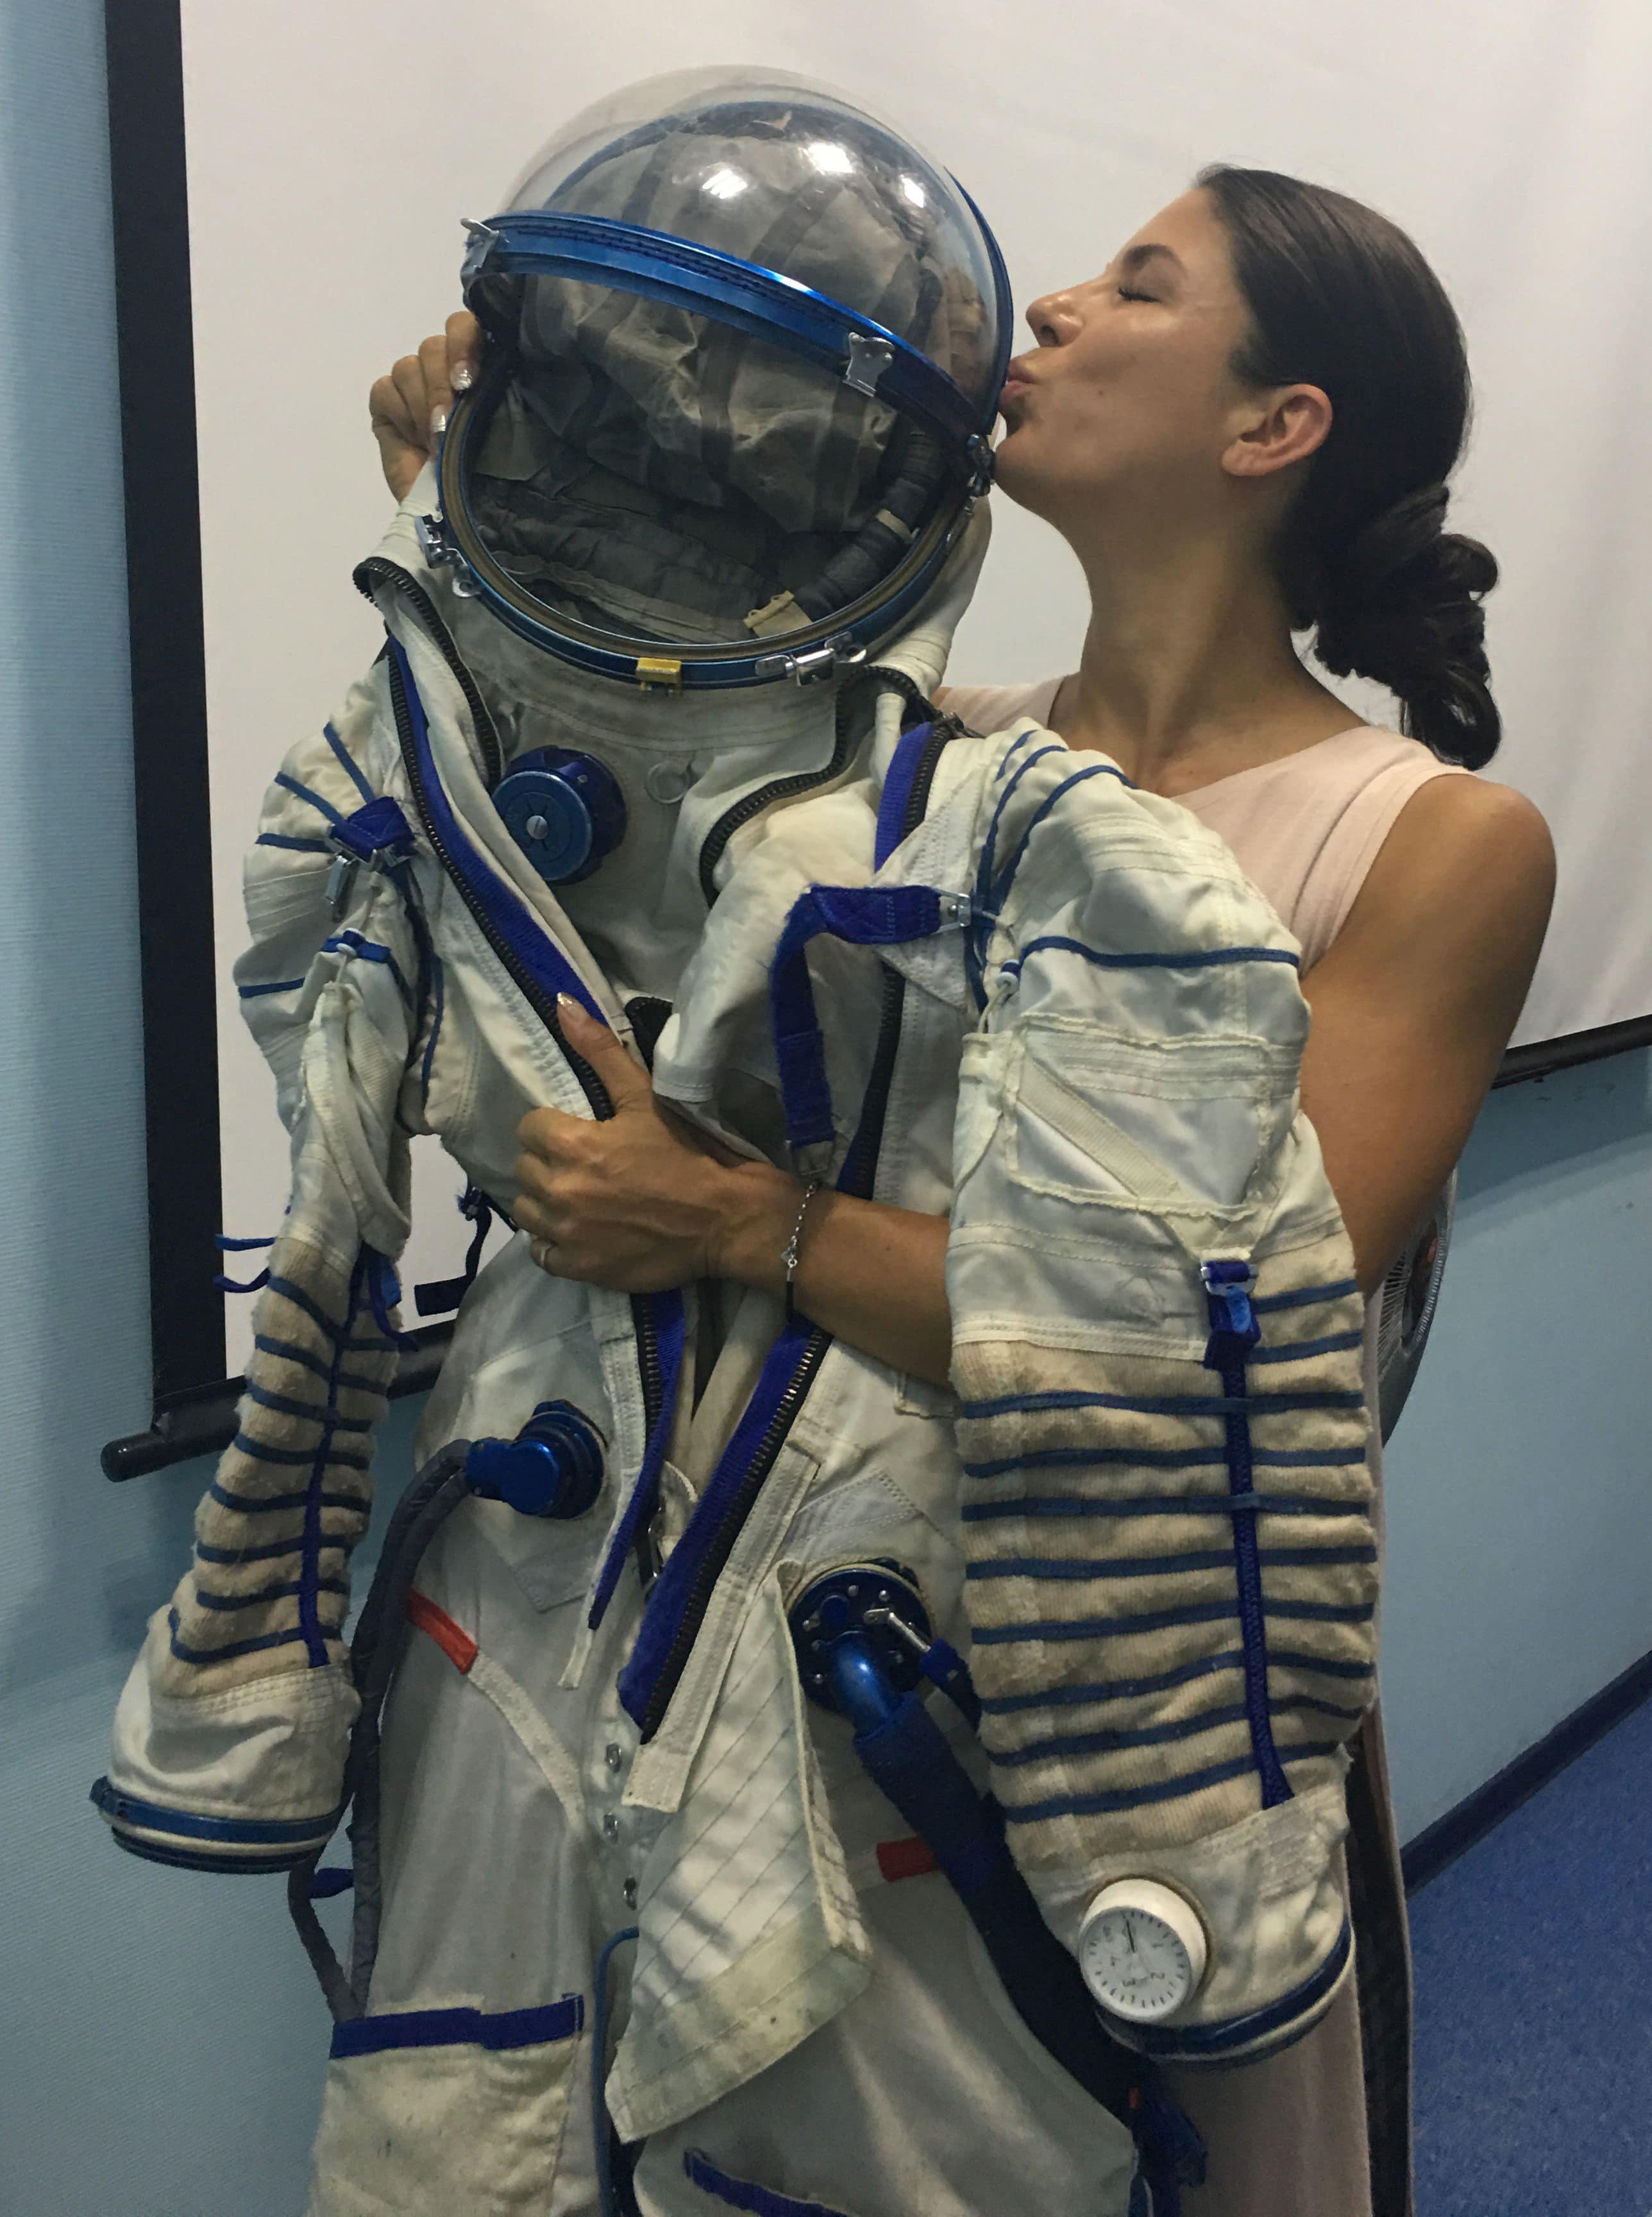 Astronautin Laura Winterling mit Raumanzug